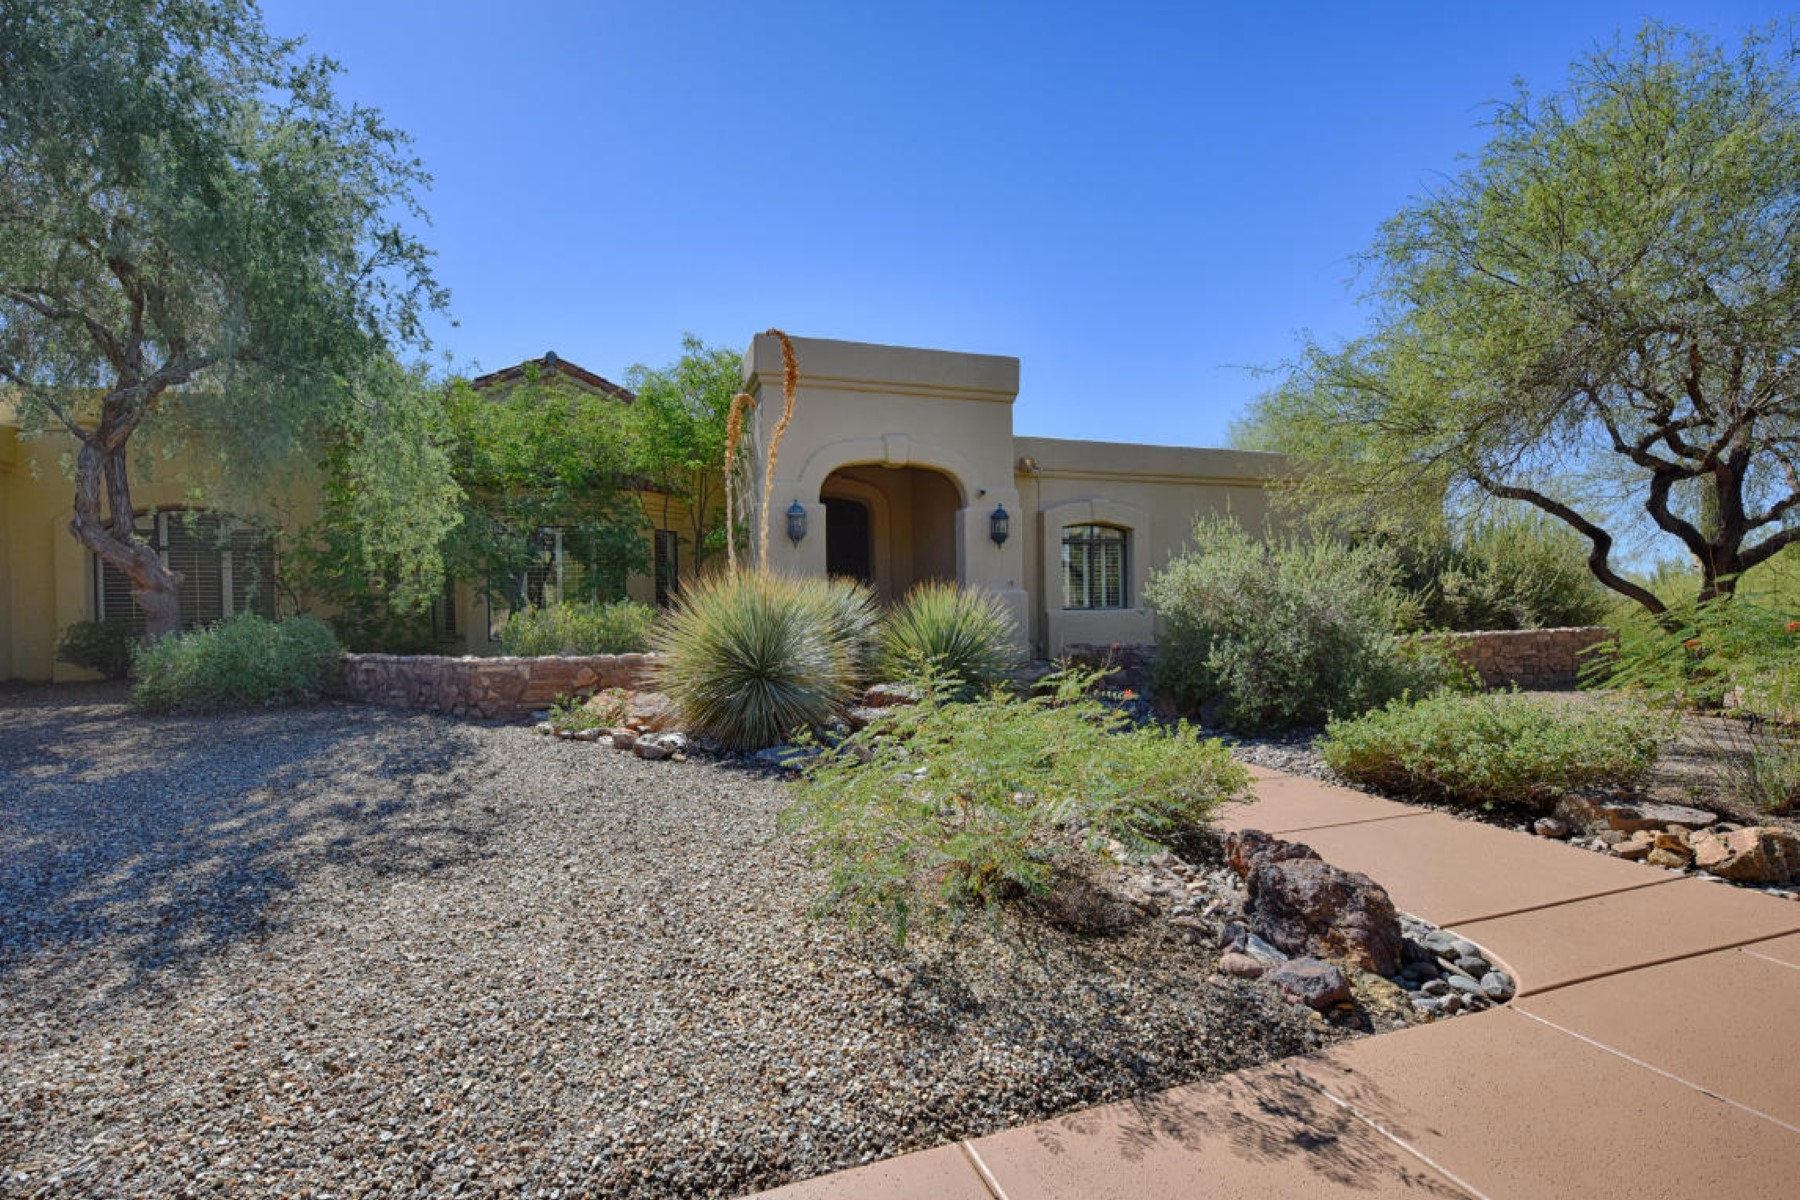 Vivienda unifamiliar por un Venta en Lovely Scottsdale home in Pinnacle Peak 9725 E Sands Dr Scottsdale, Arizona, 85255 Estados Unidos